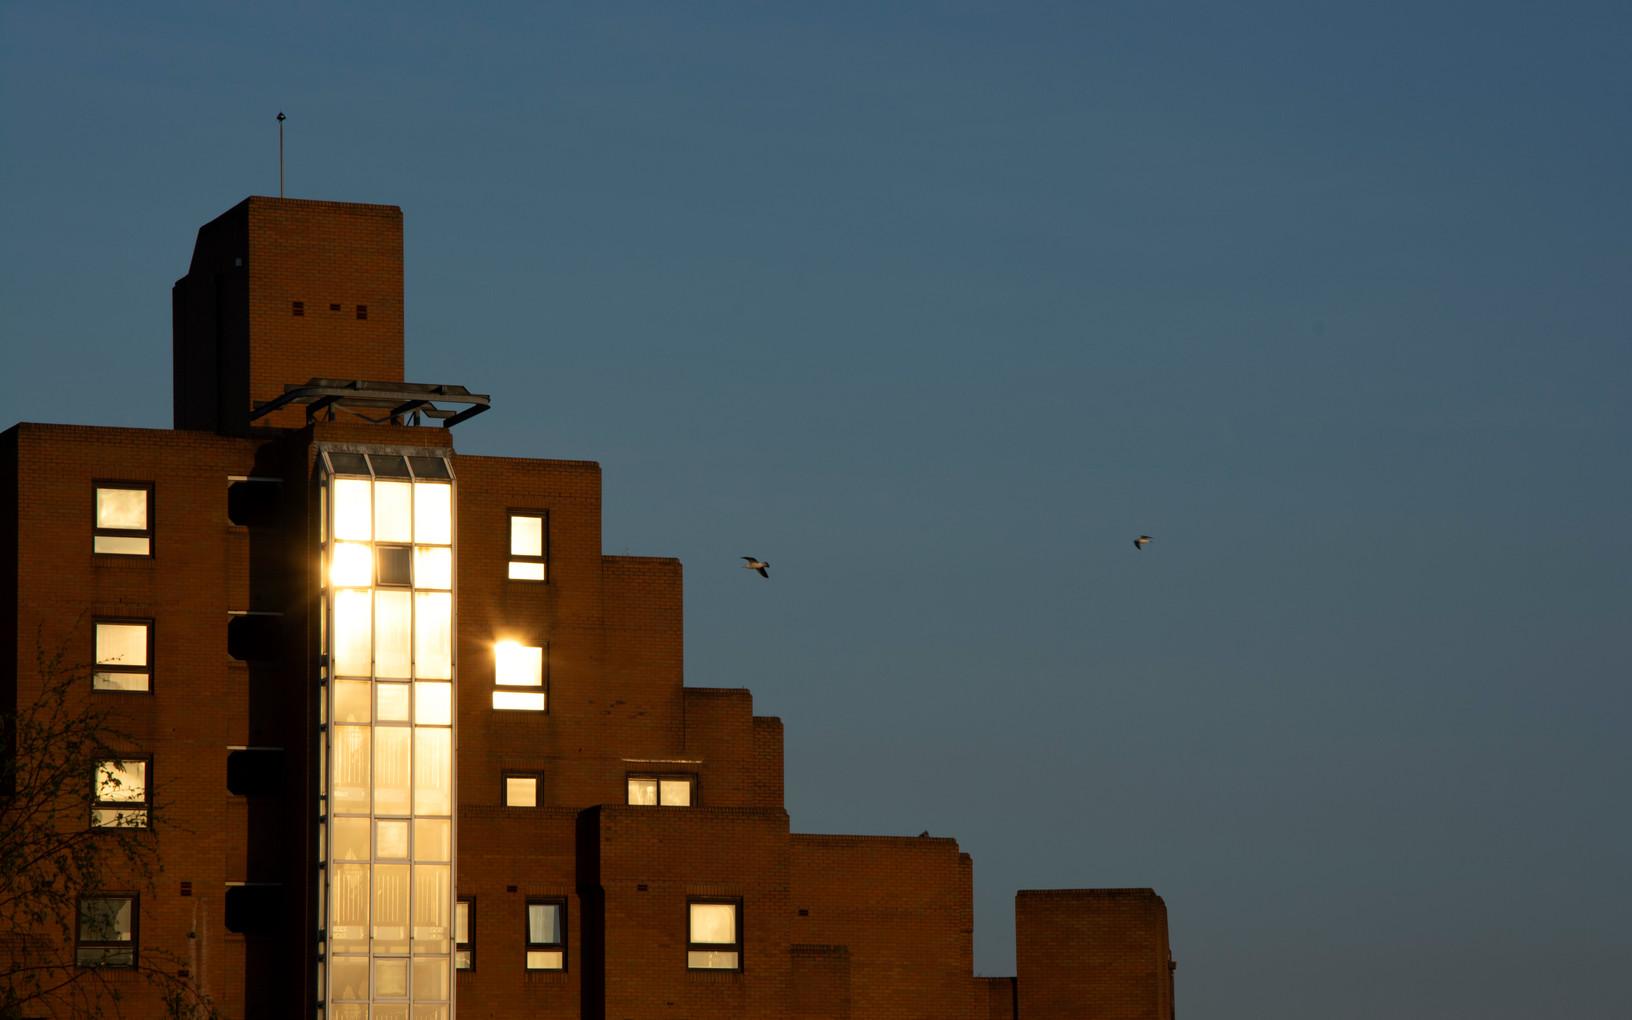 Sunset with seagulls | London, April 2020.